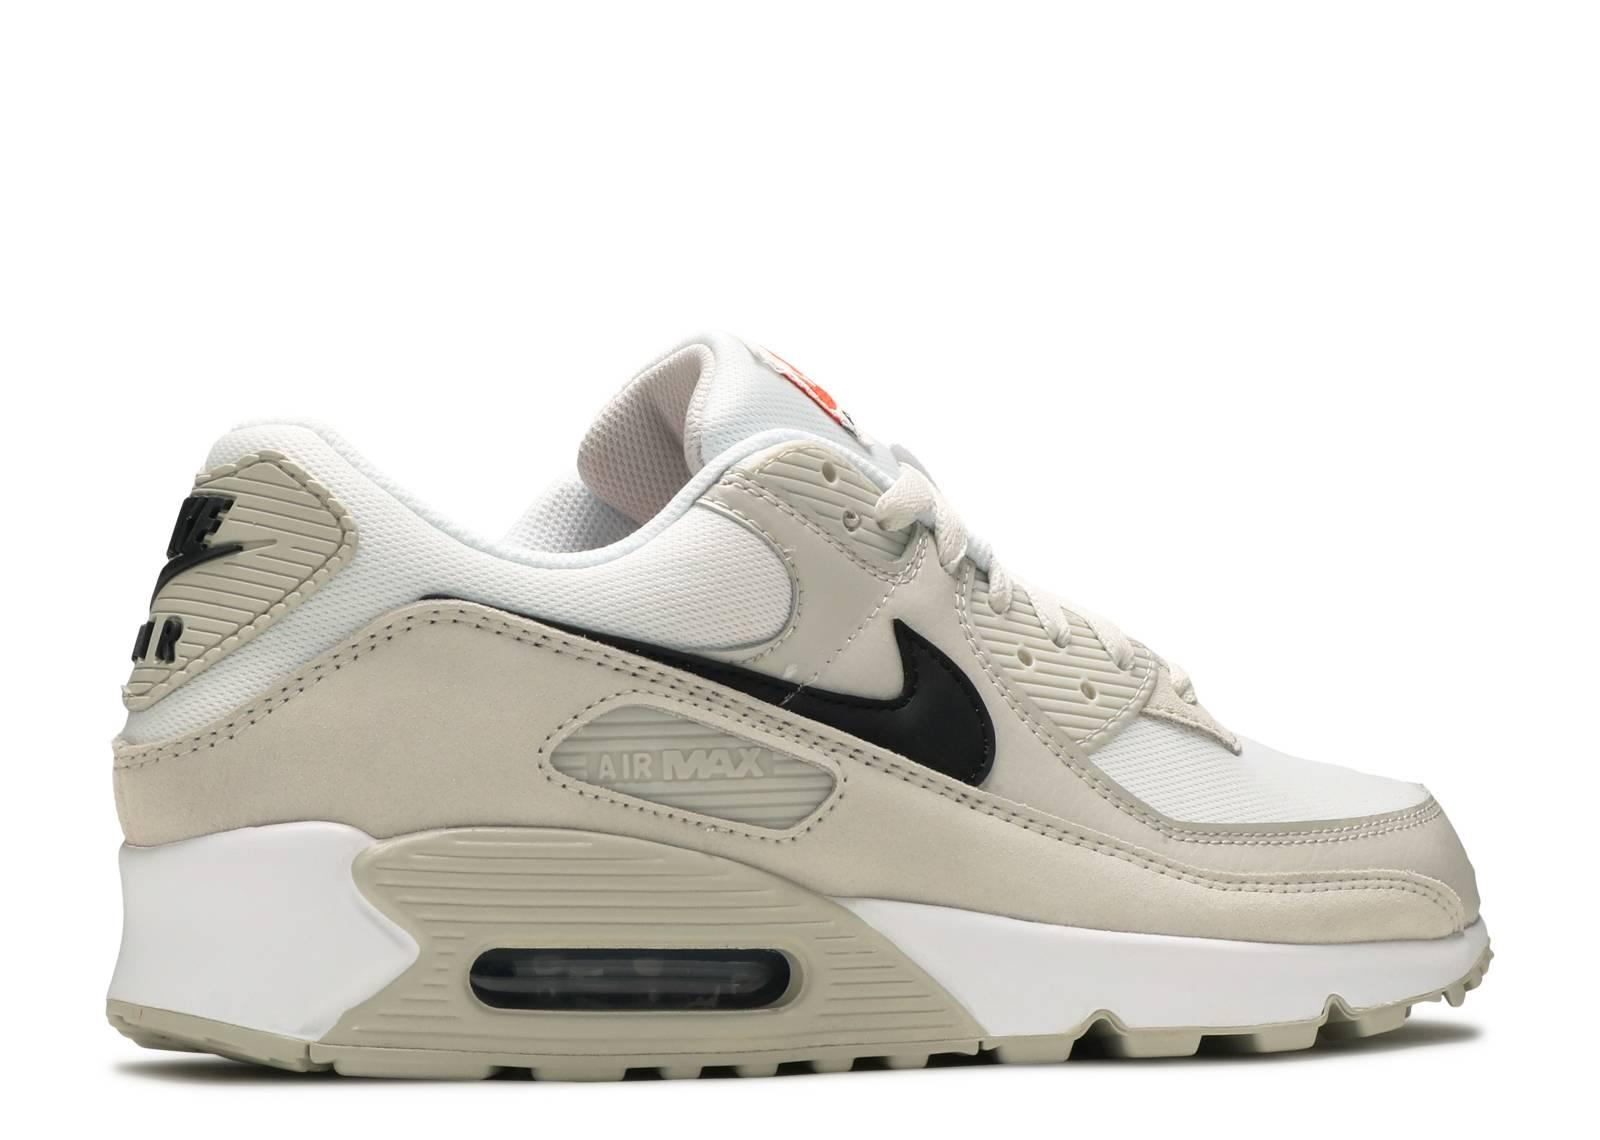 Air Max 90 'Light Bone' - Nike - DH4103 100 - white/black/light ...